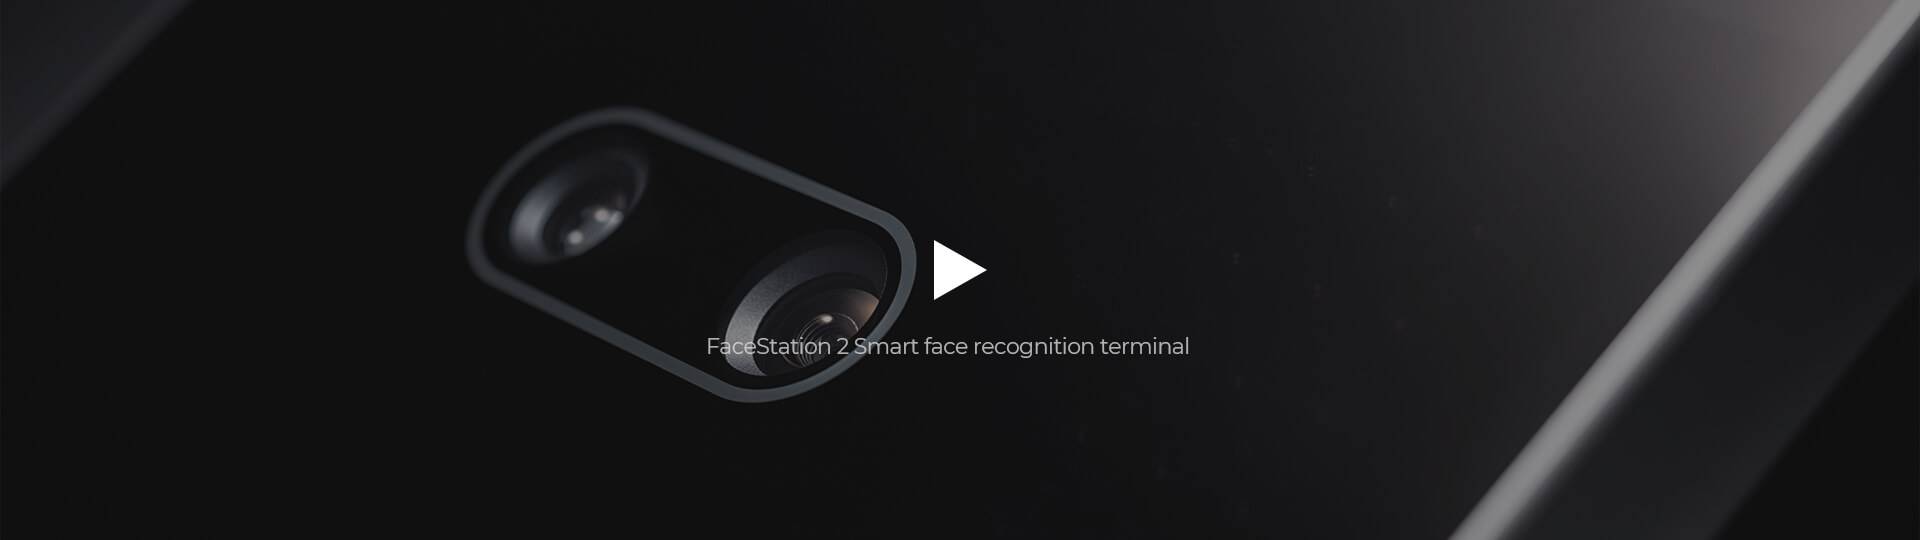 smart face recoginion terminal video |